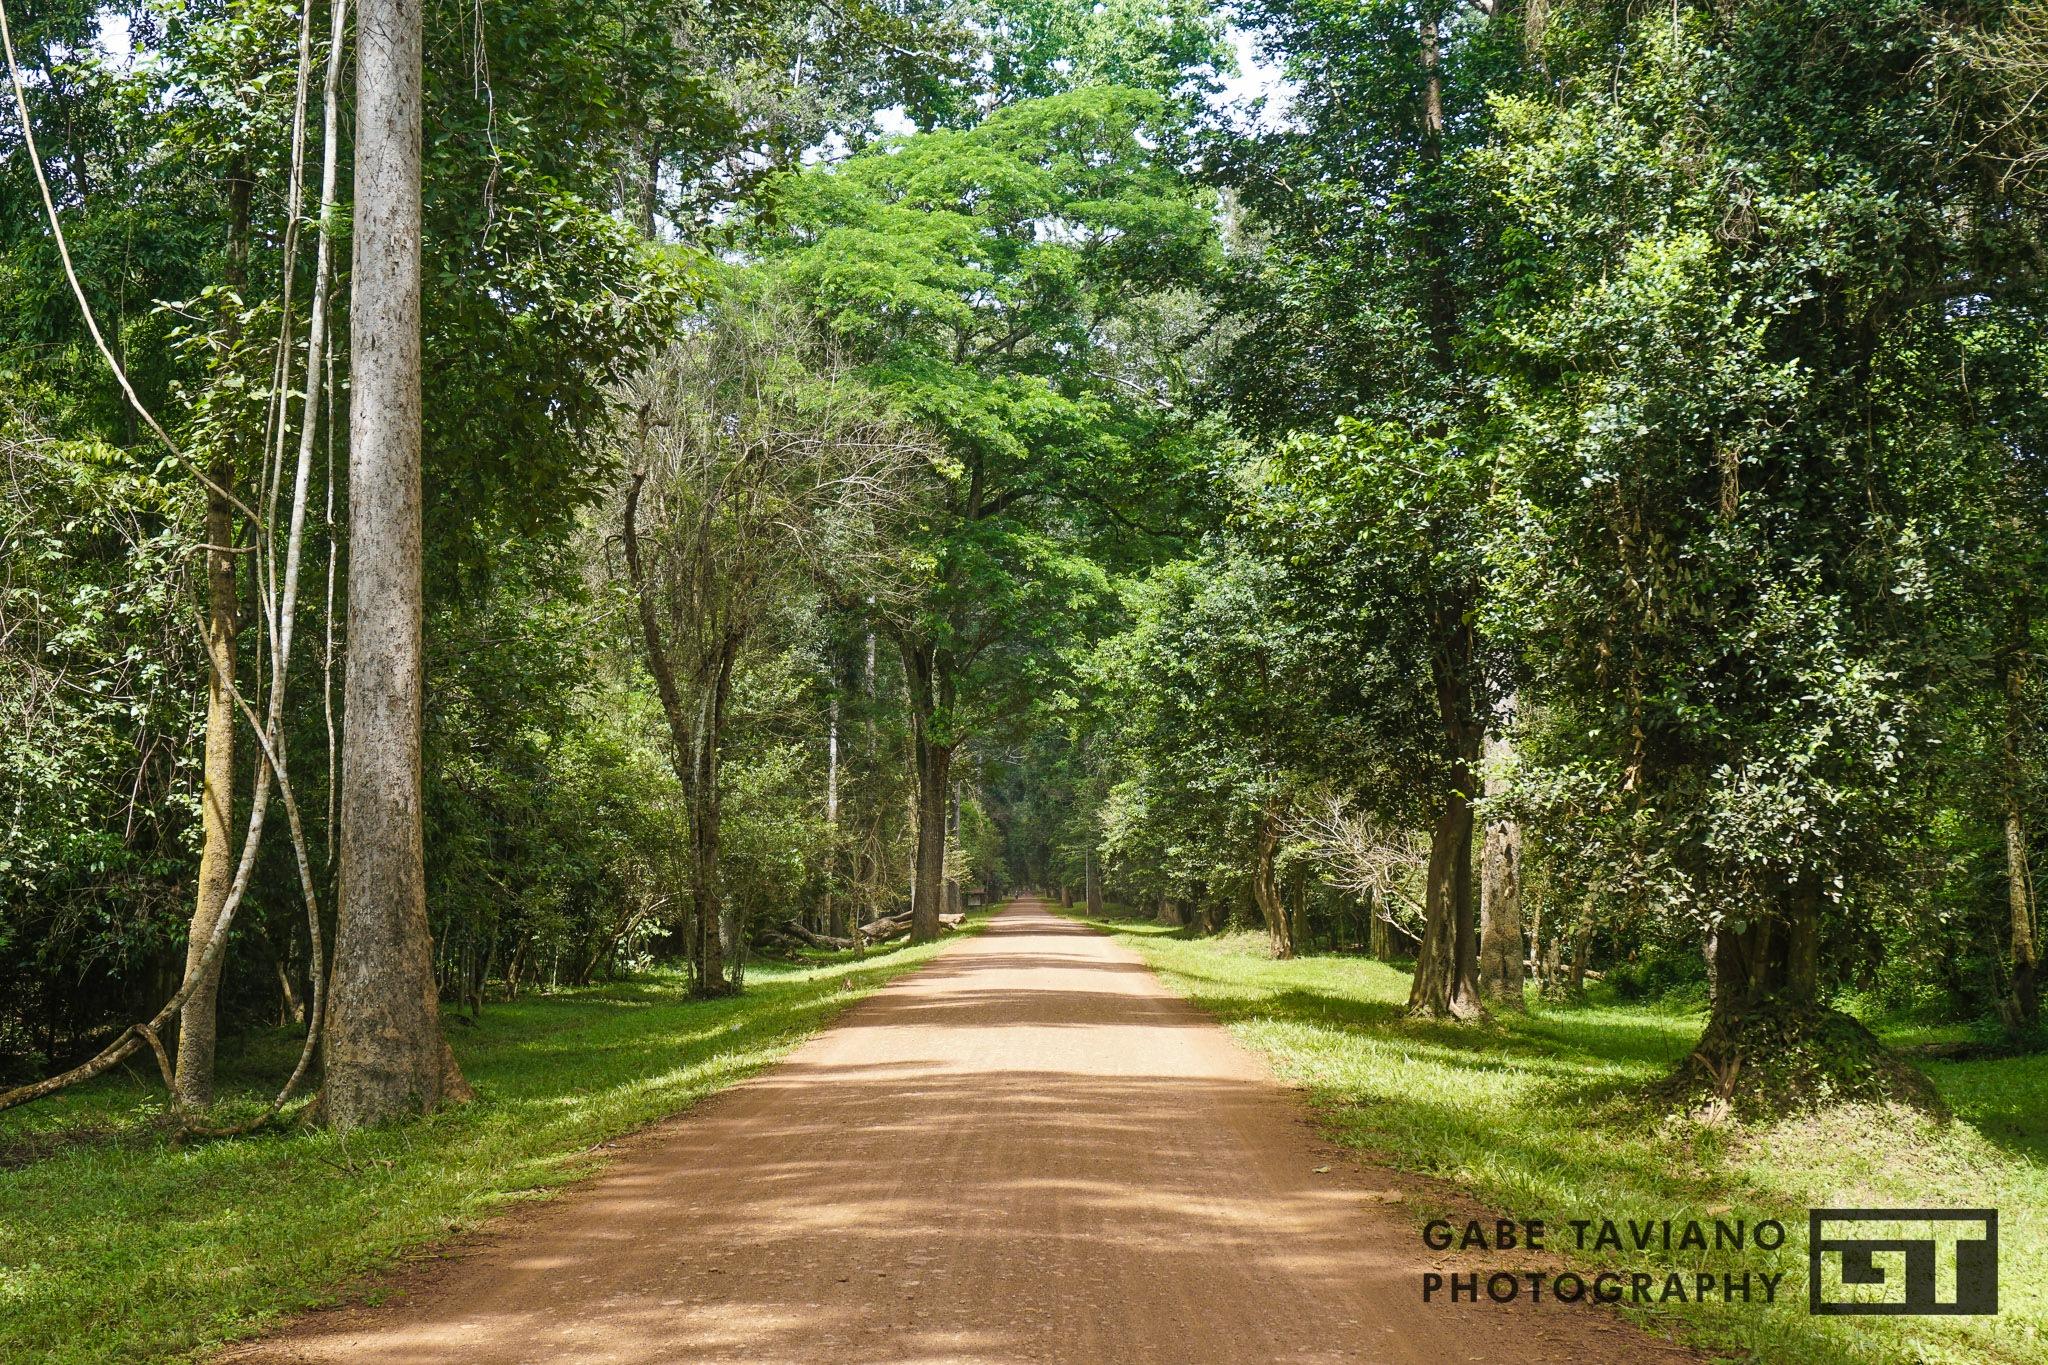 Long road ahead by Gabe Taviano